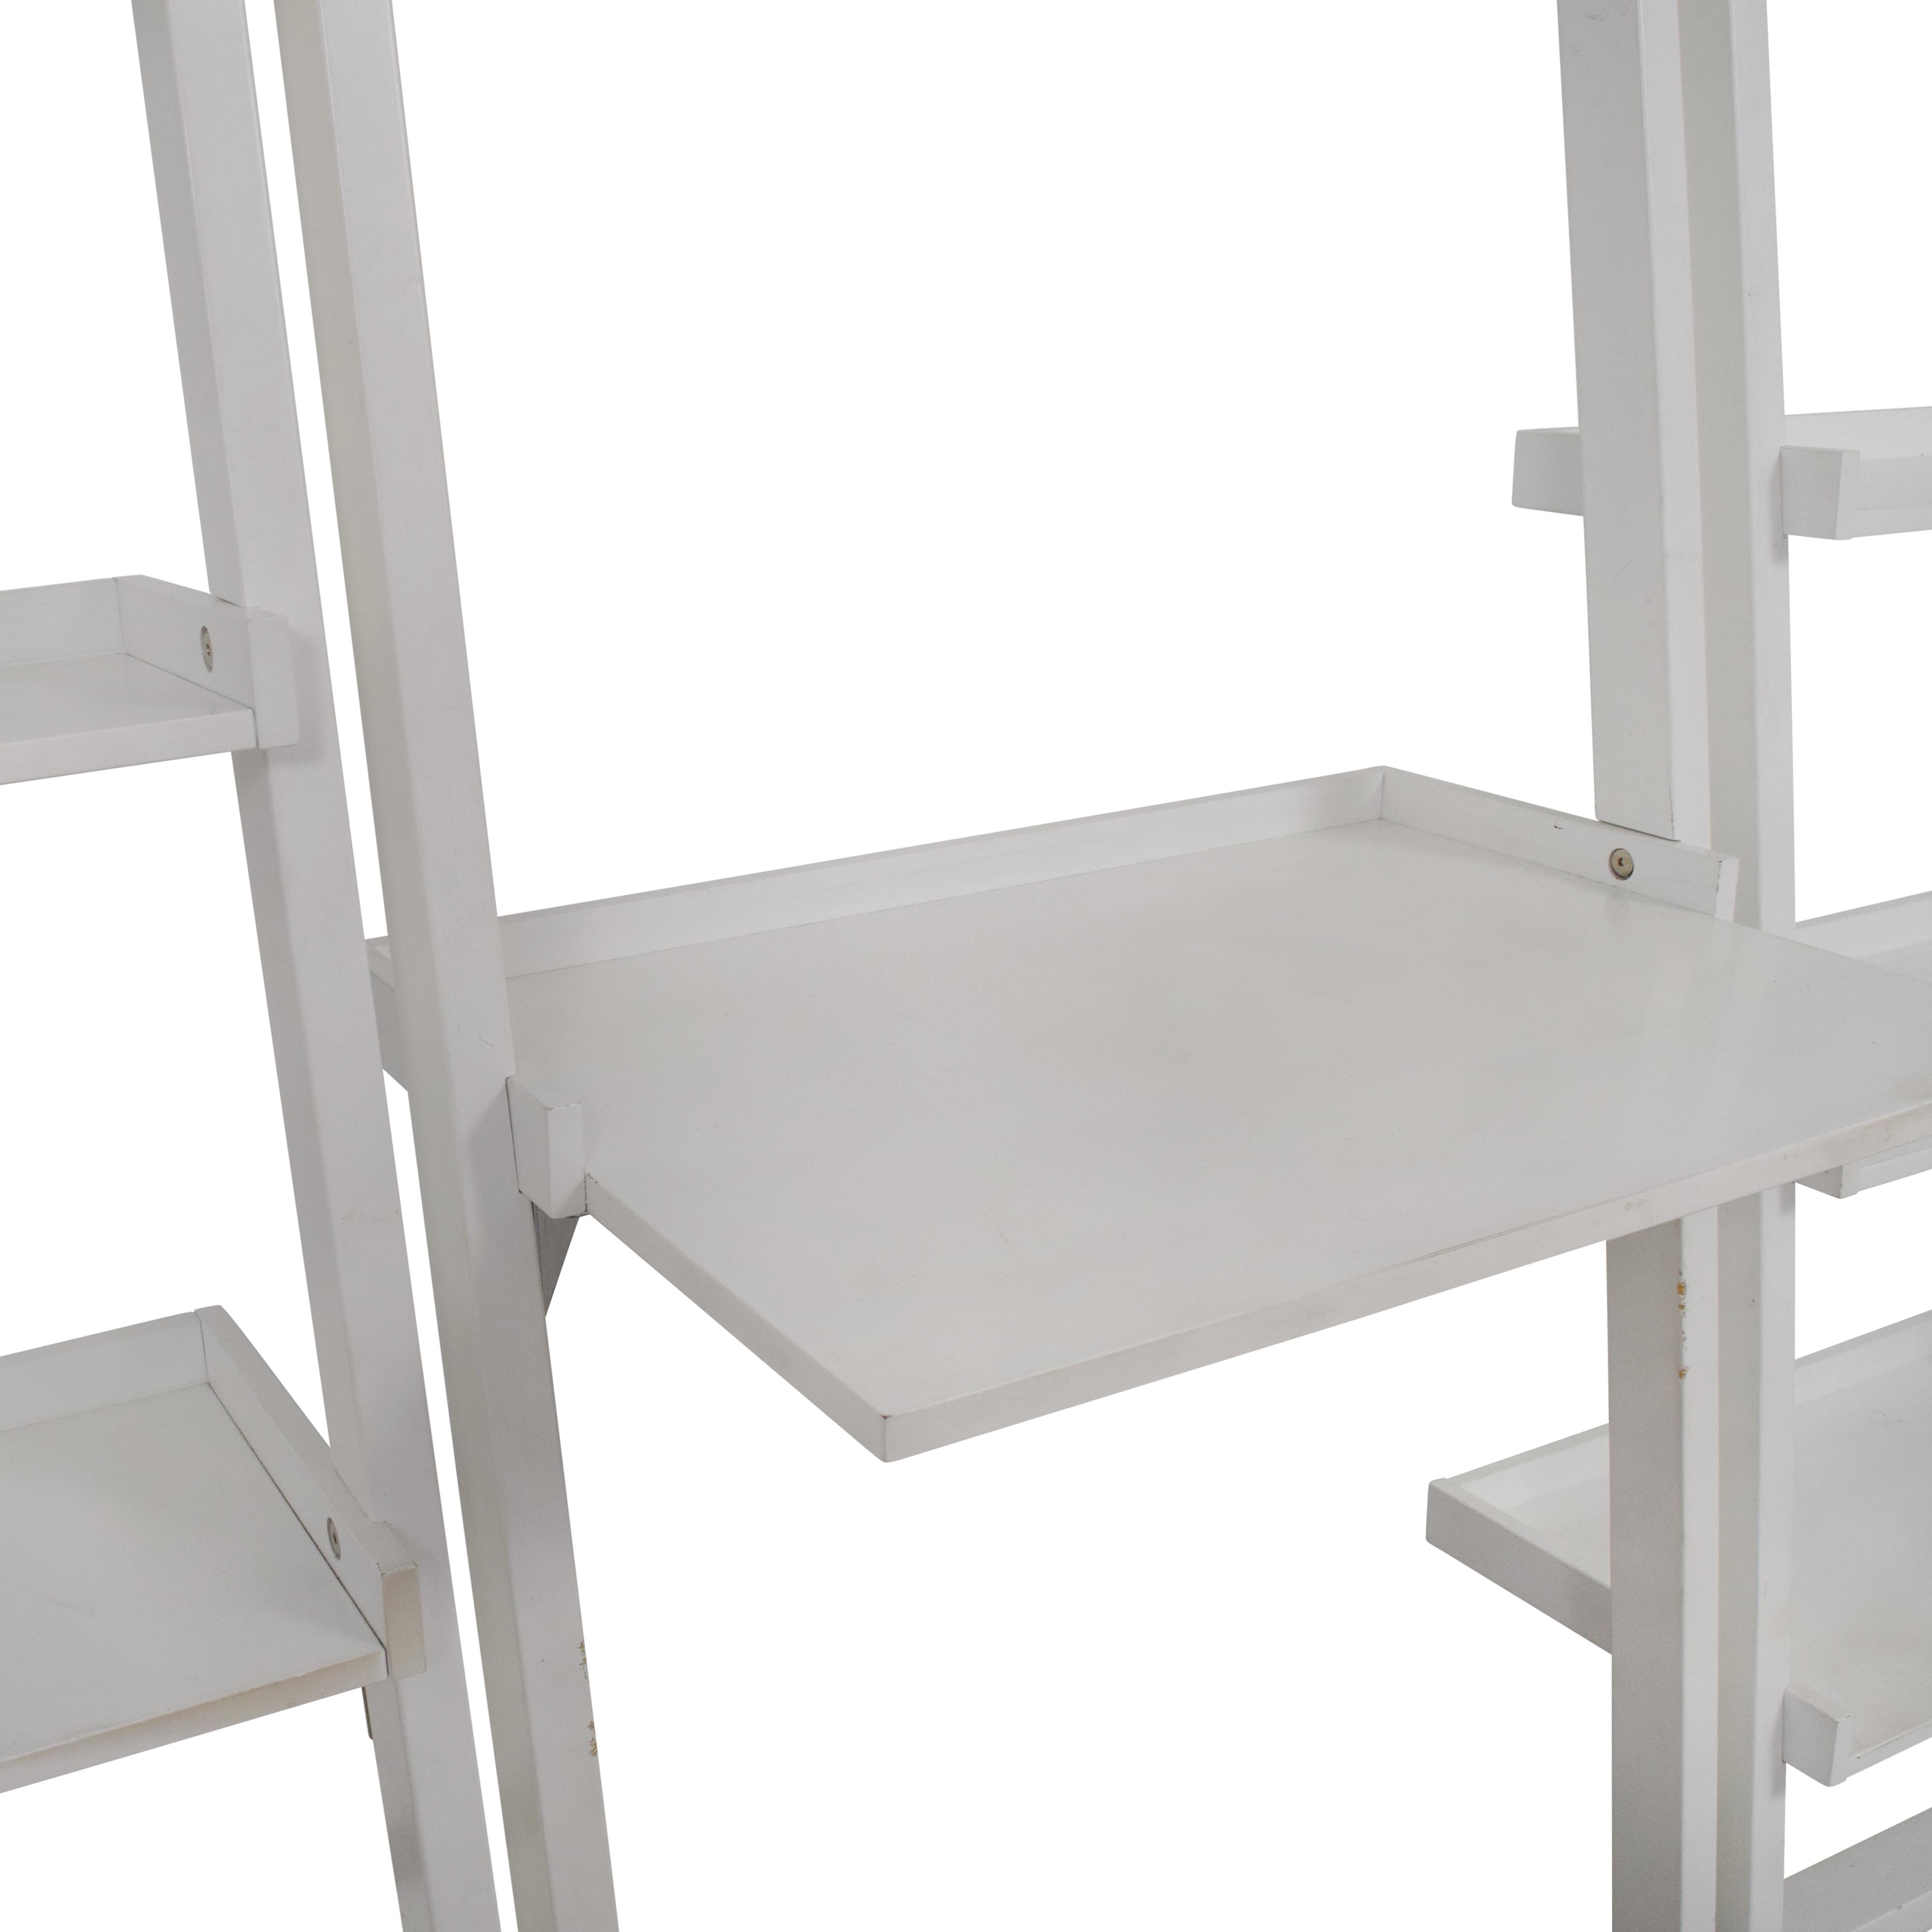 Crate & Barrel Crate & Barrel Leaning White Bookshelf White